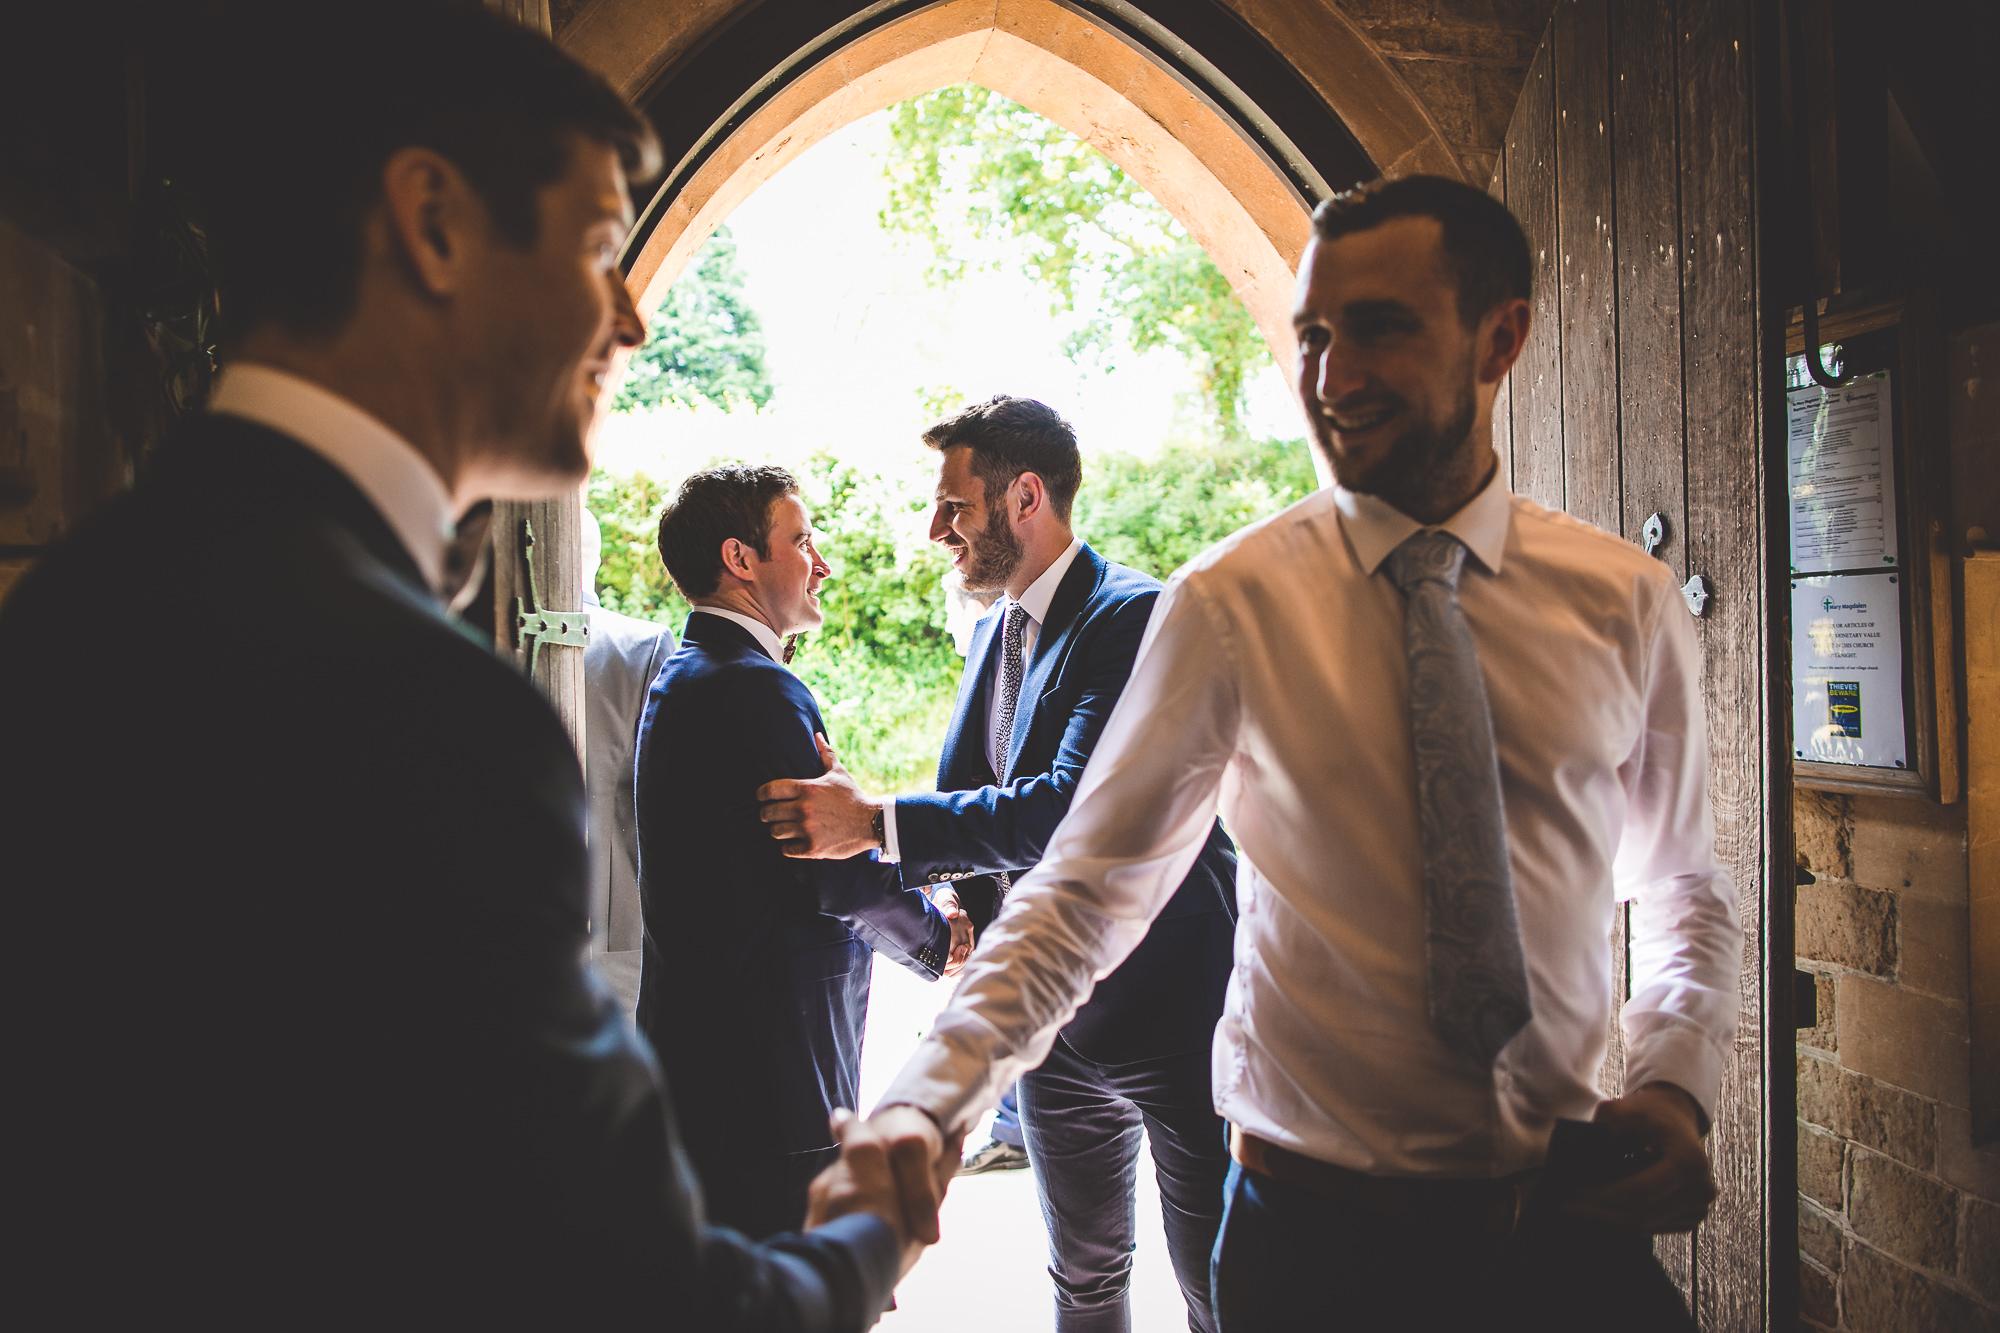 Veils & Bales Wedding Photography | Charlie & Steve SCSS 059